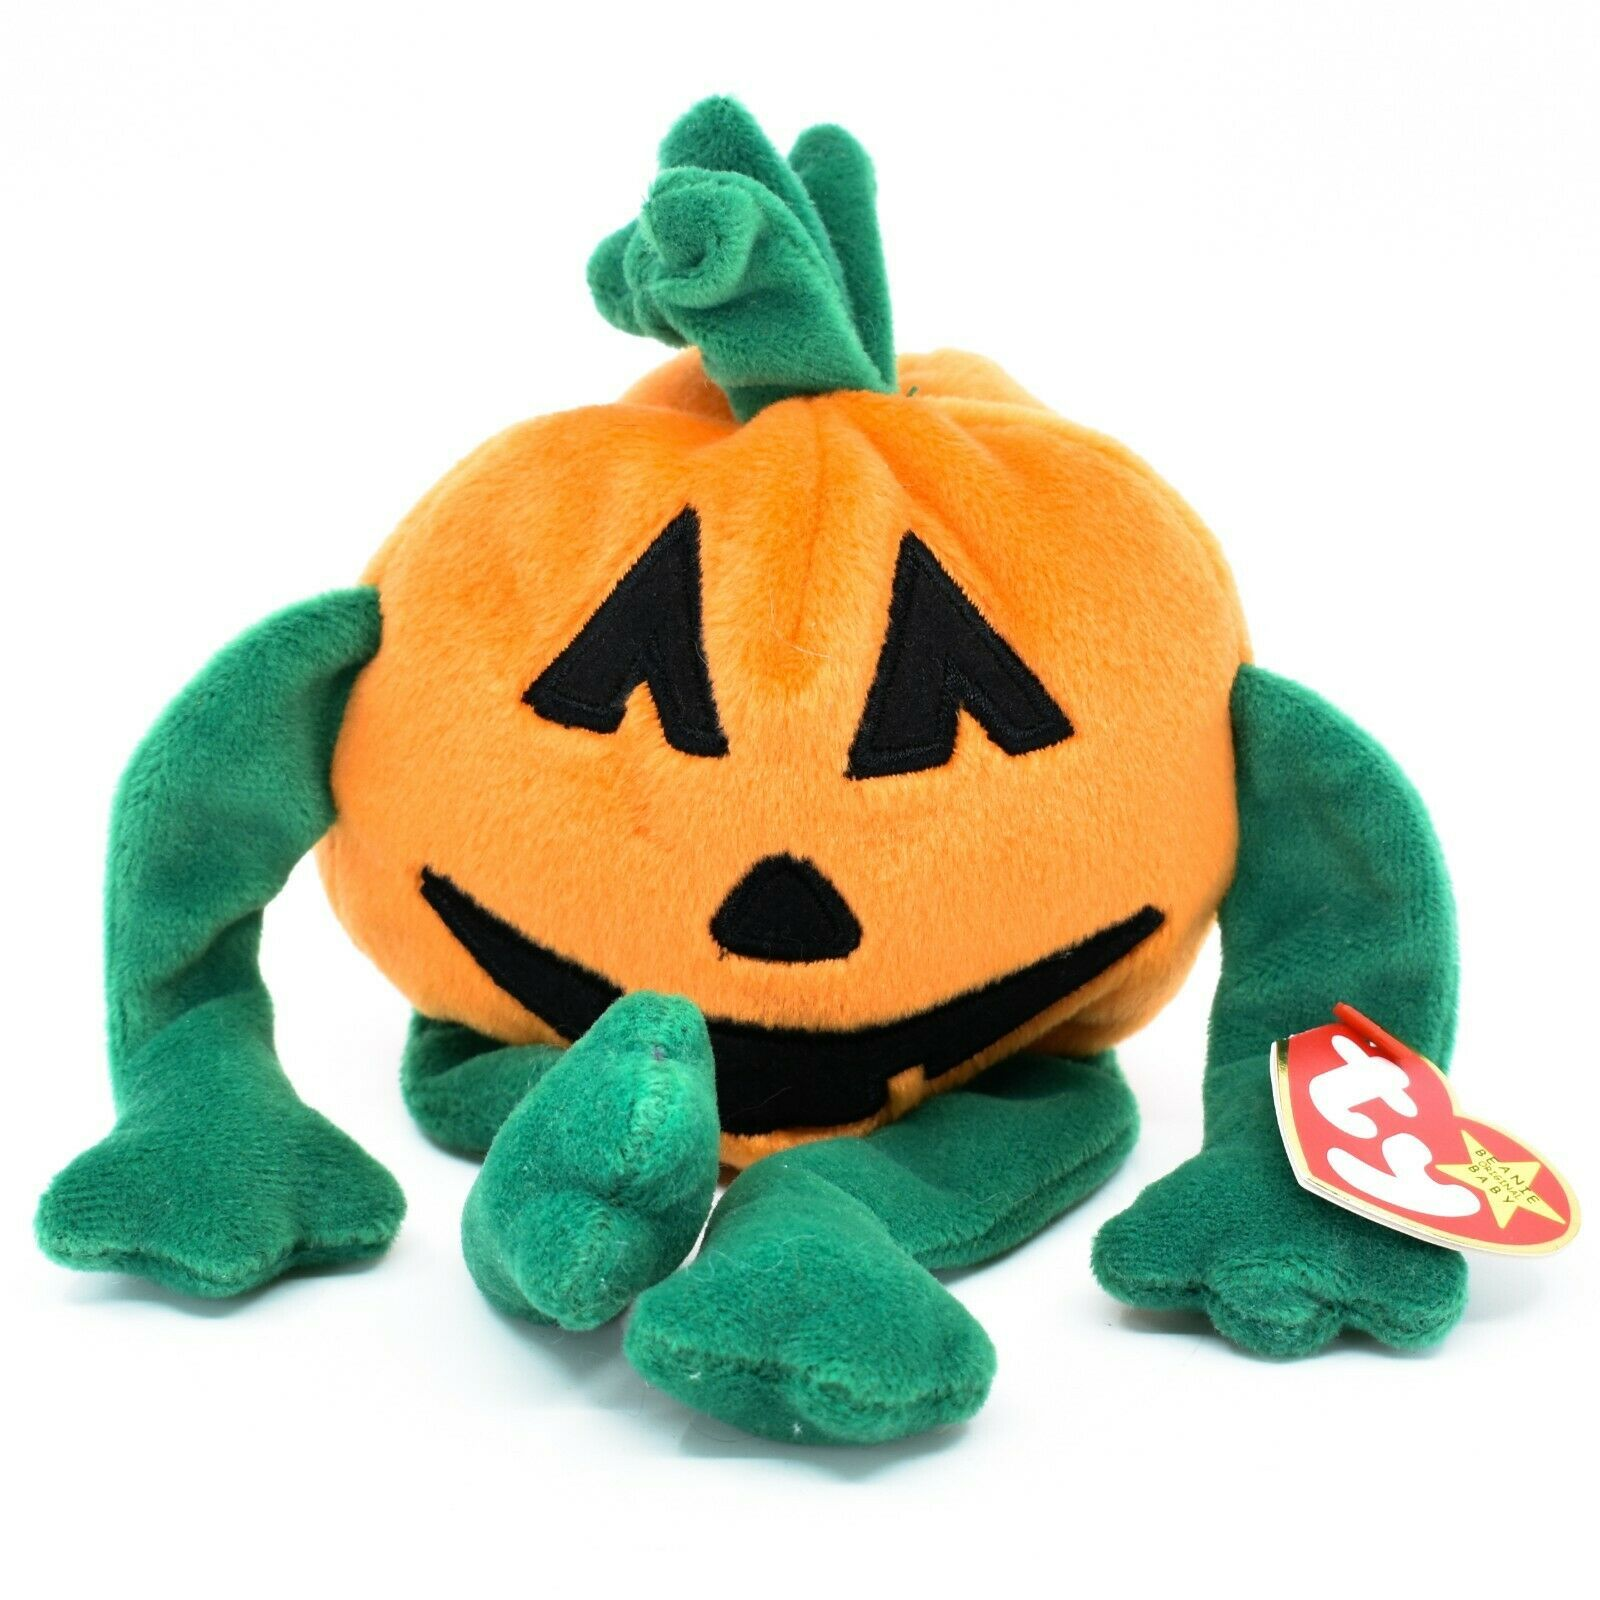 1998 TY Beanie Baby Original Pumkin Pumpkin Halloween Jack-O-Lantern Plush Toy